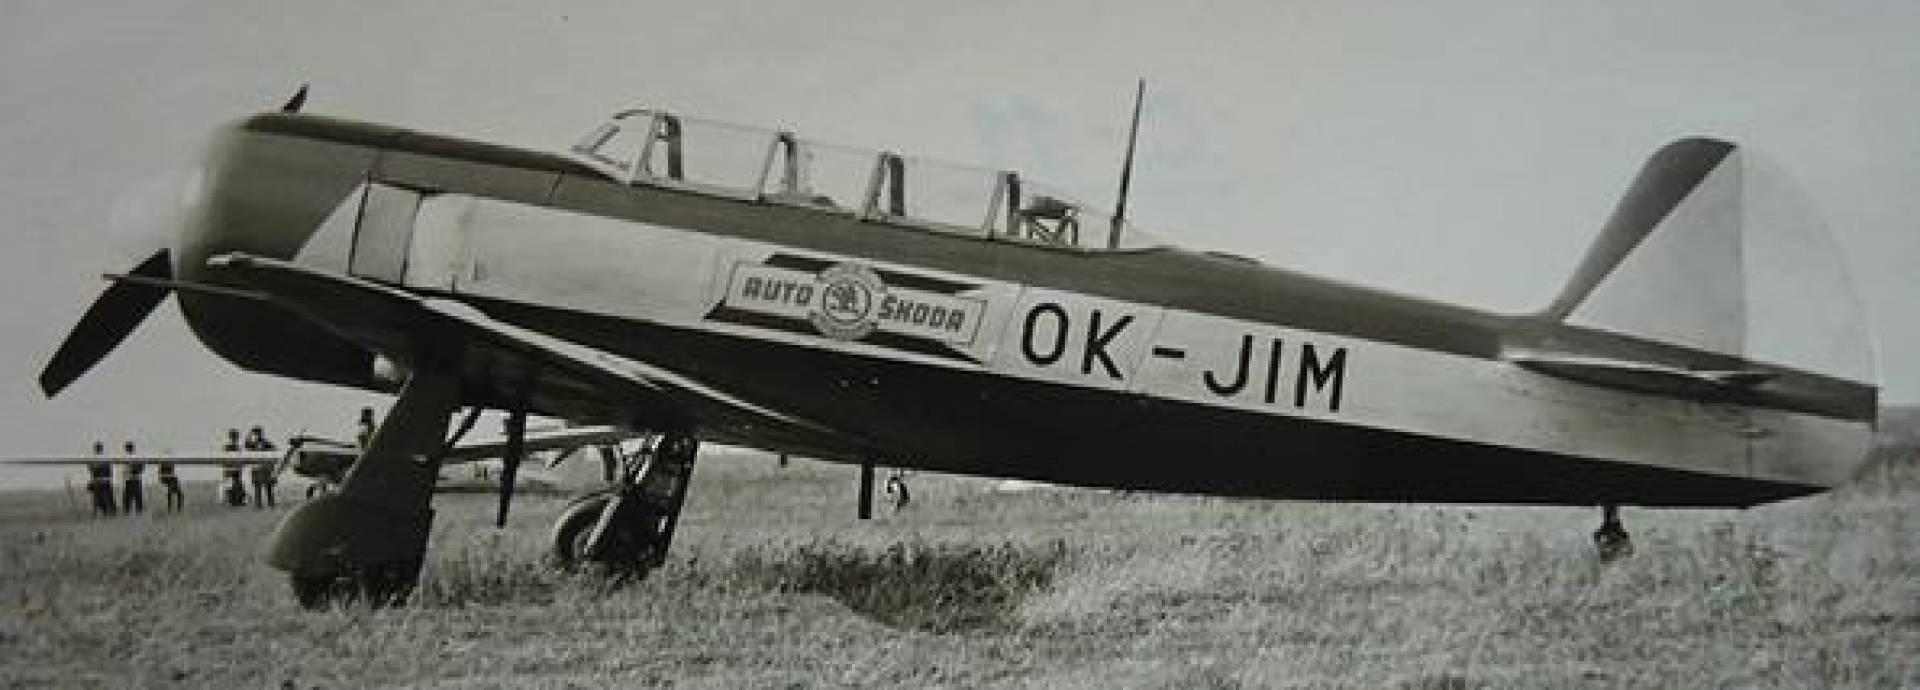 Jak-11